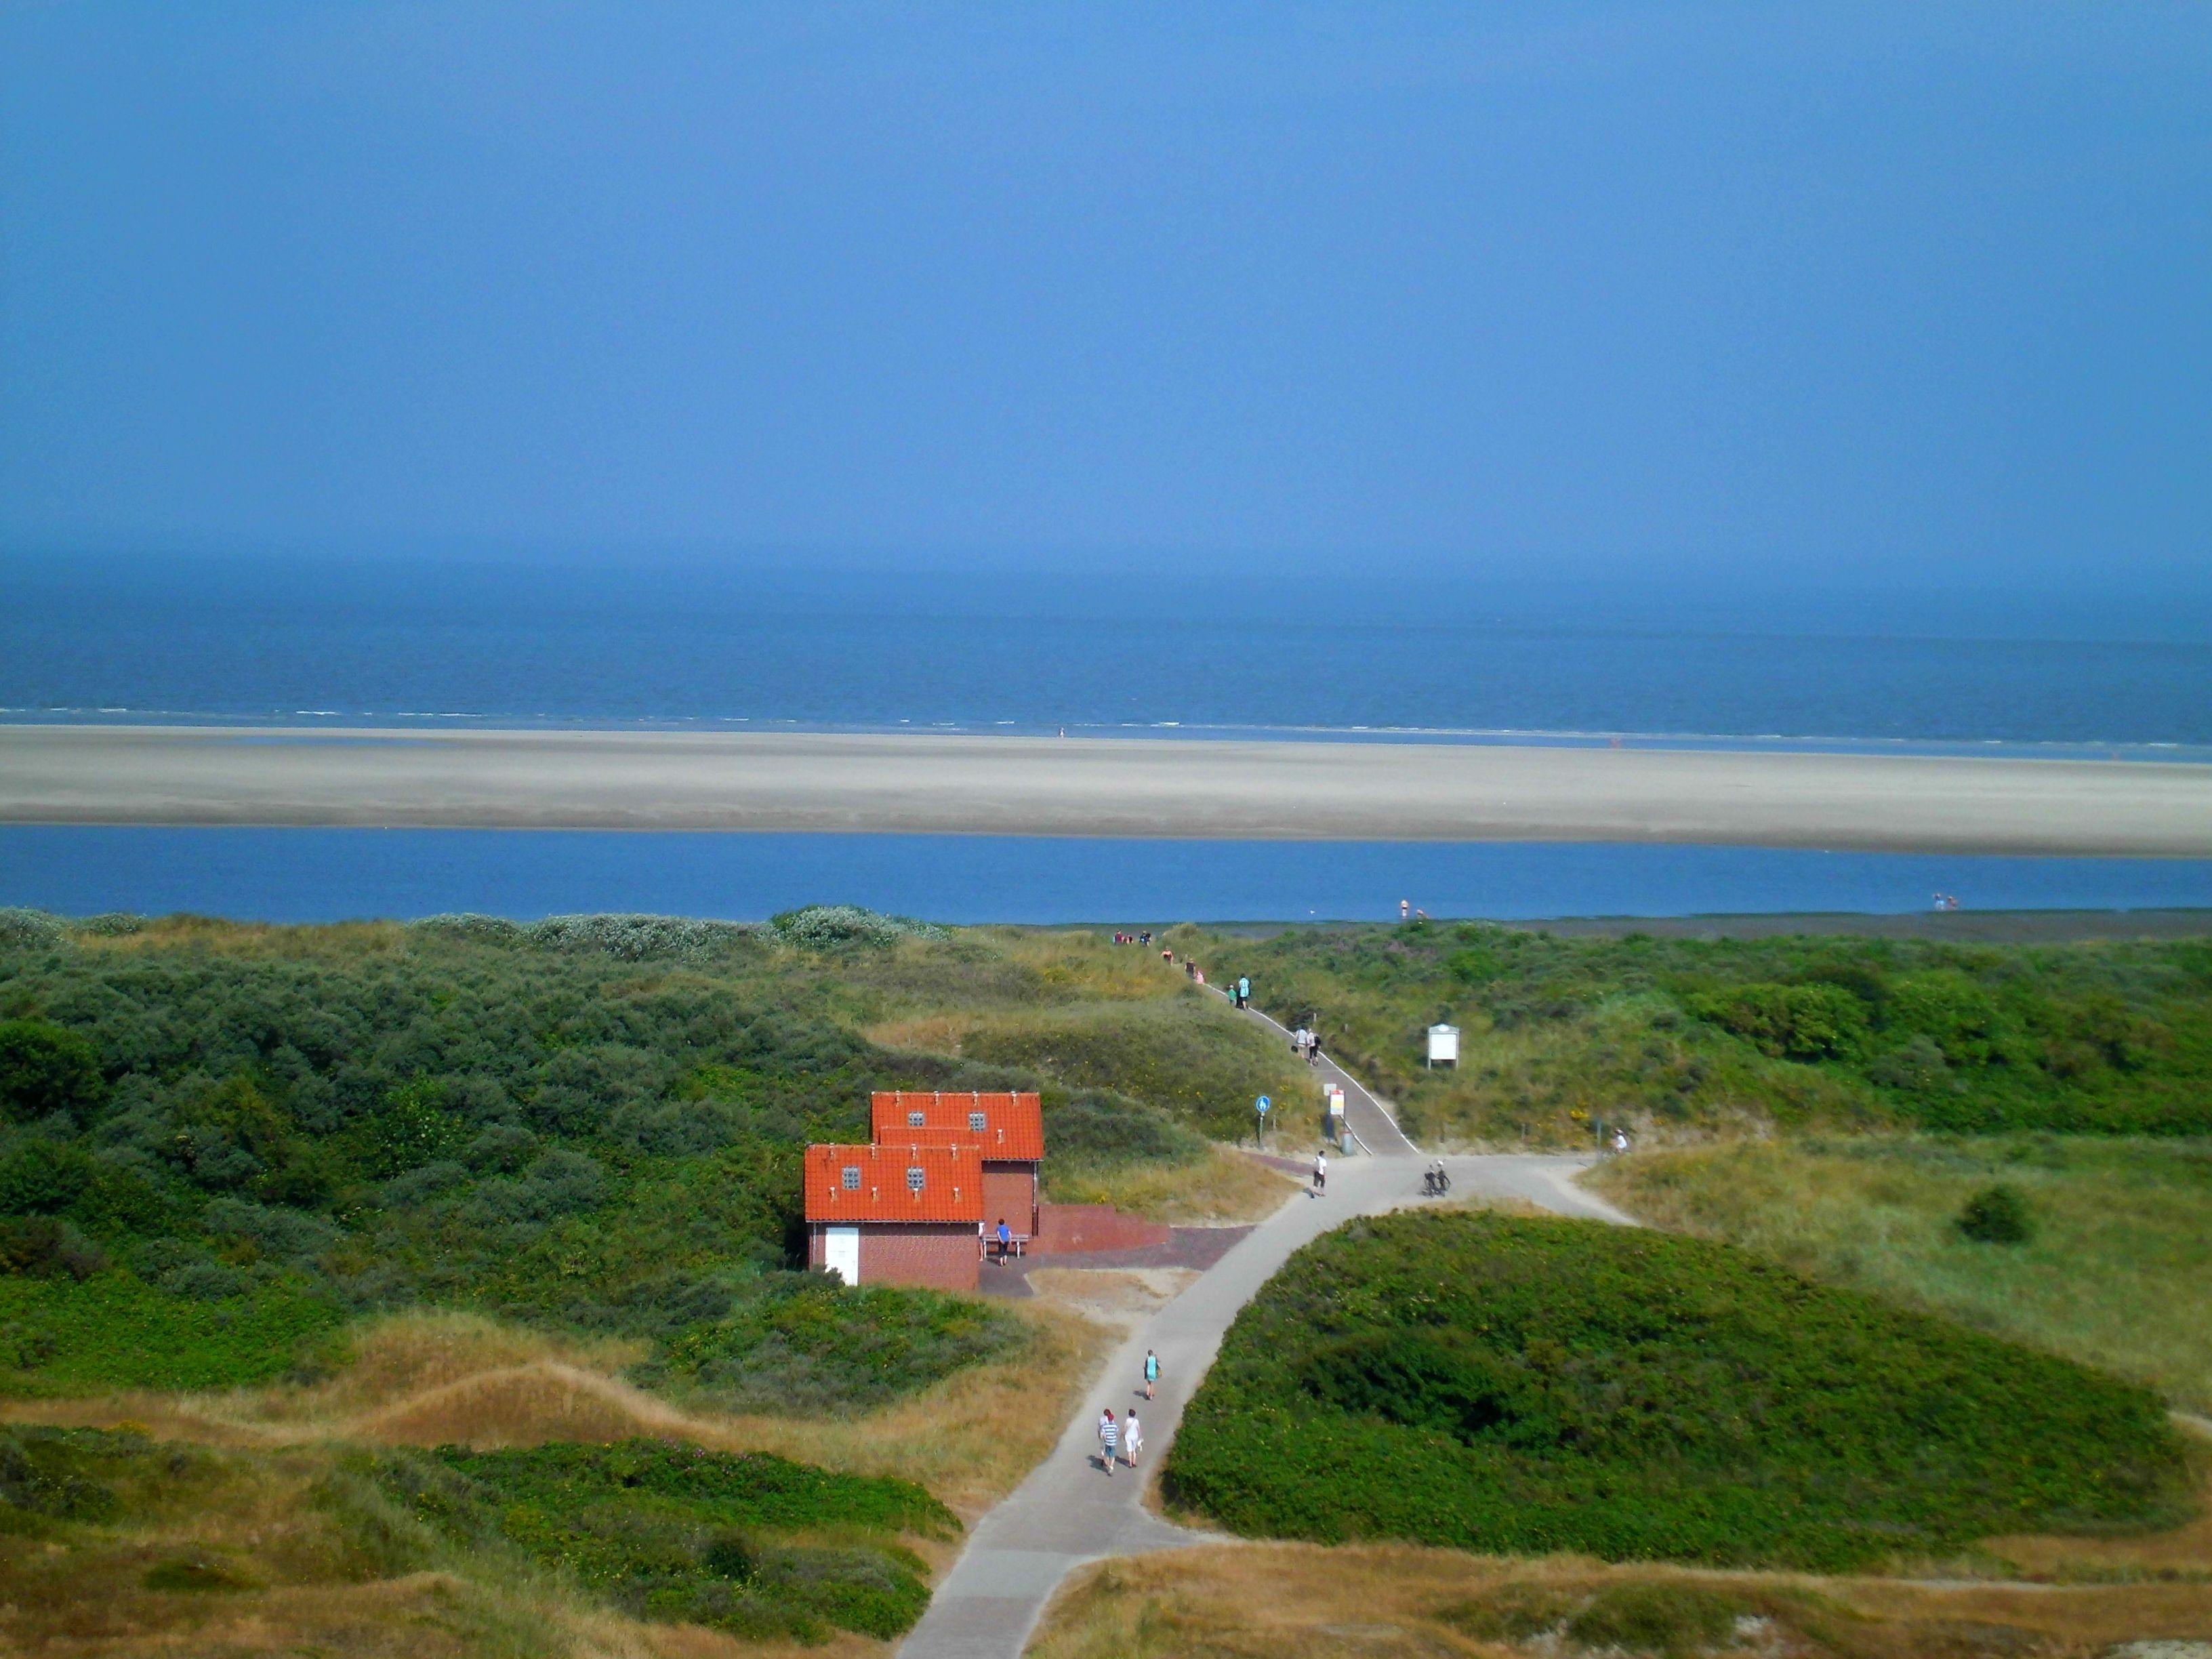 Island of Langeoog, Germany